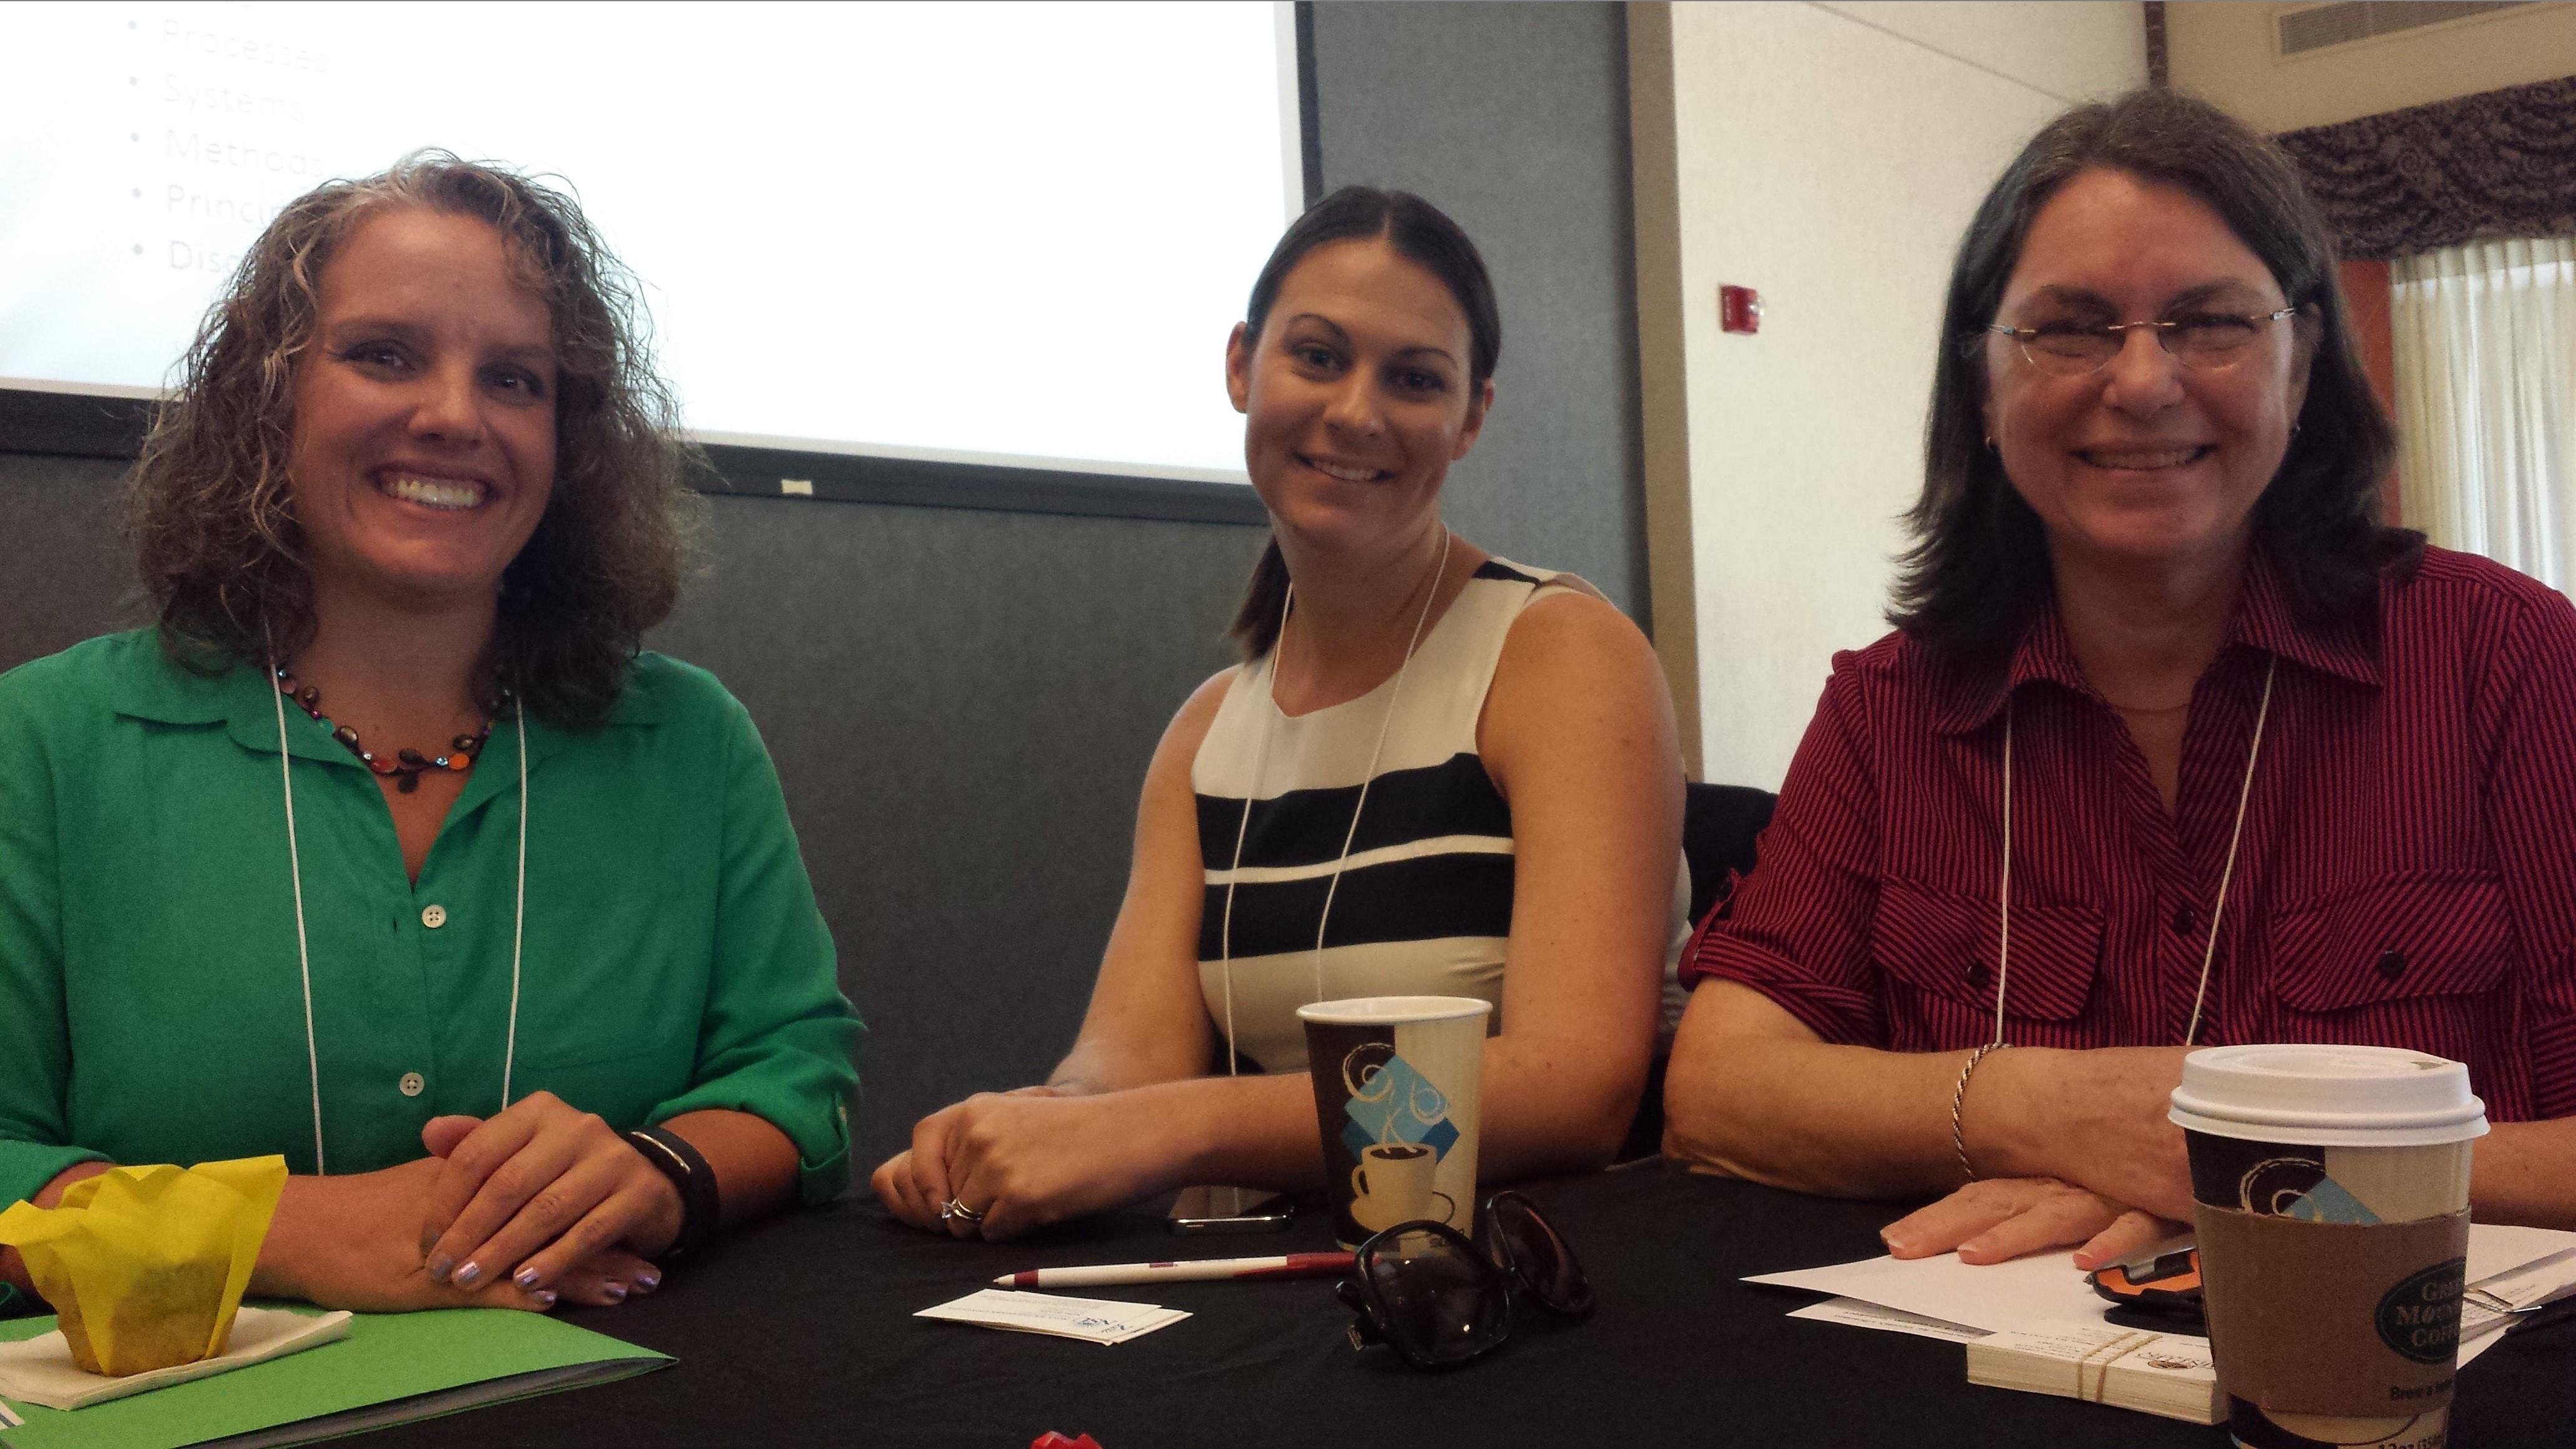 Katie McCormick, Keri Baker, and Sandy Hawes at FACRL-2014